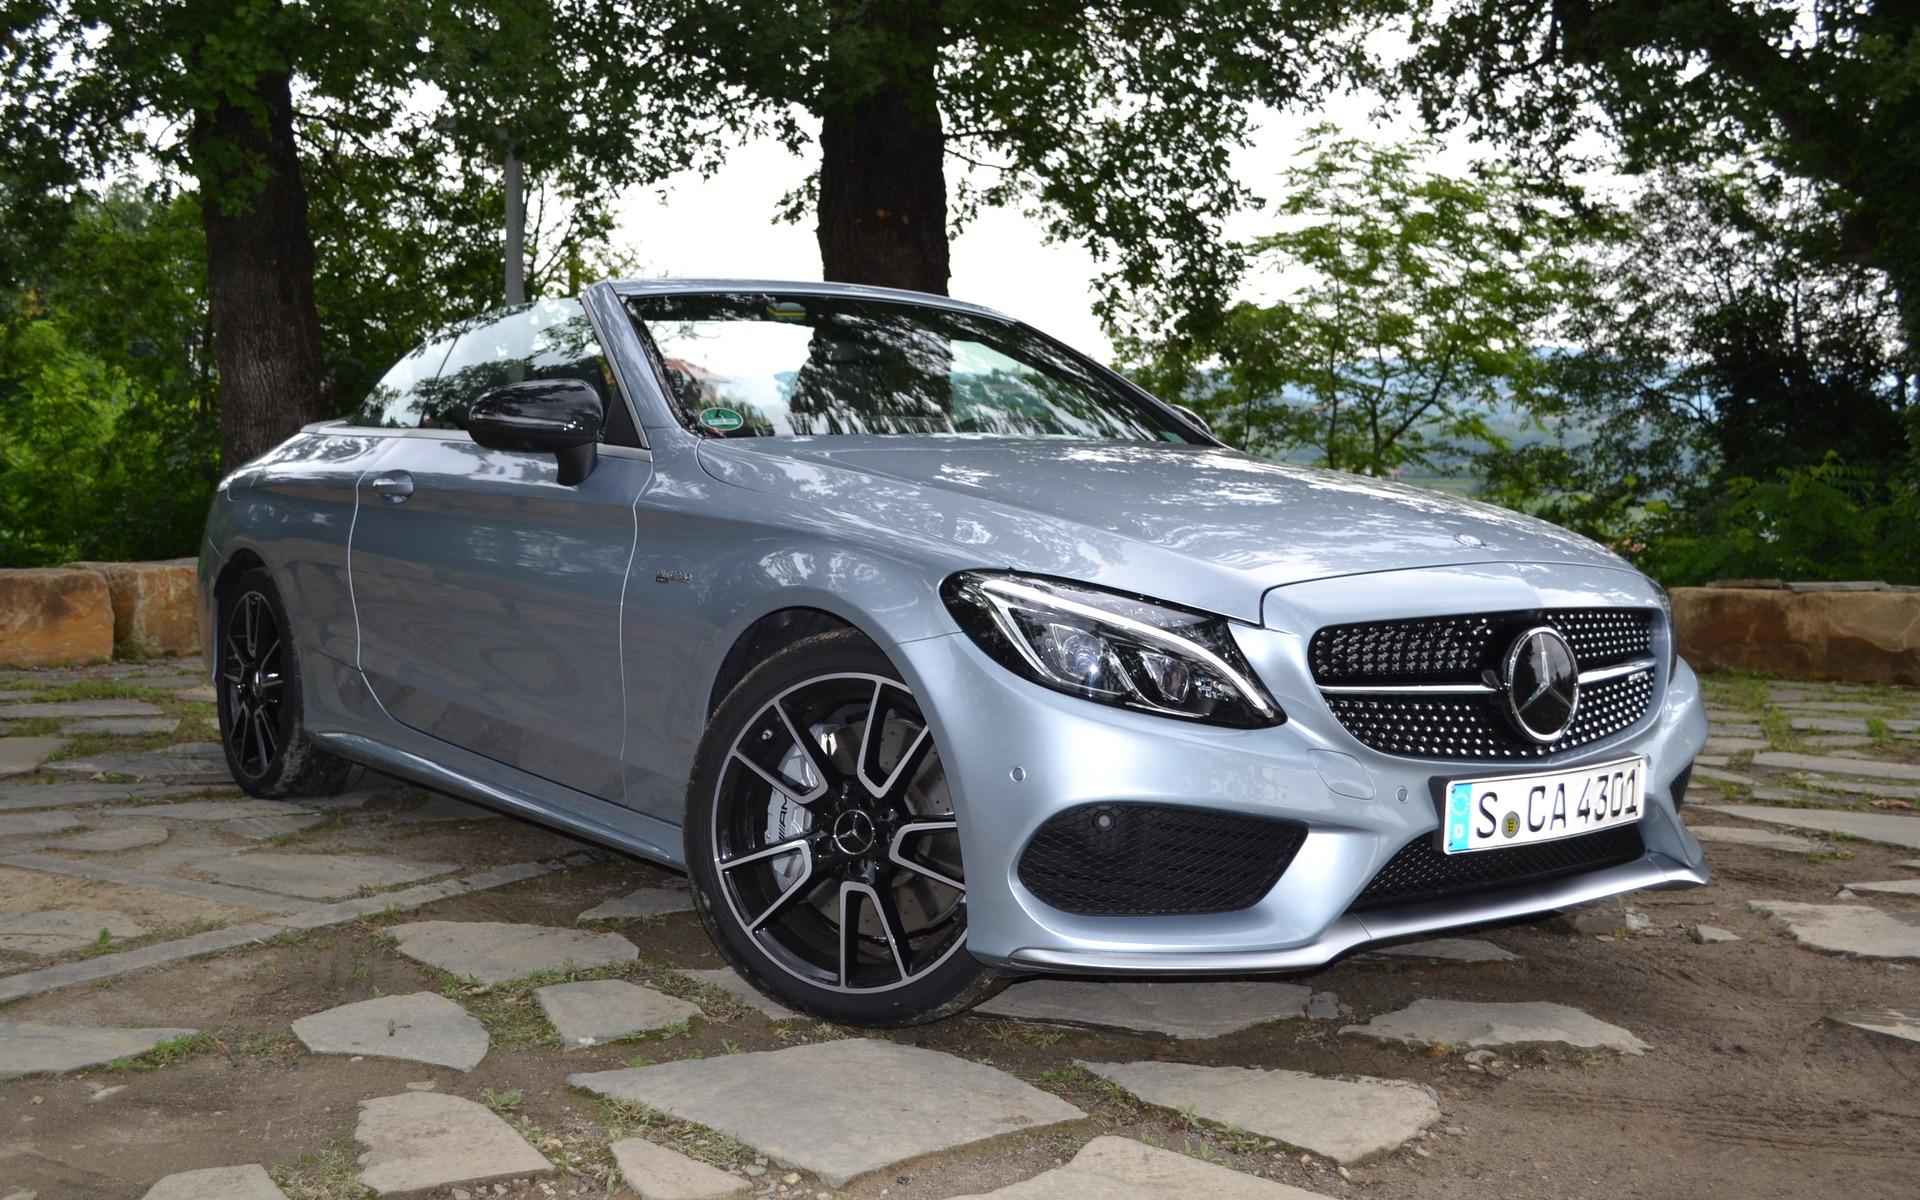 https://i.gaw.to/photos/2/5/2/252119_2017_Mercedes-Benz_C-Class.jpg